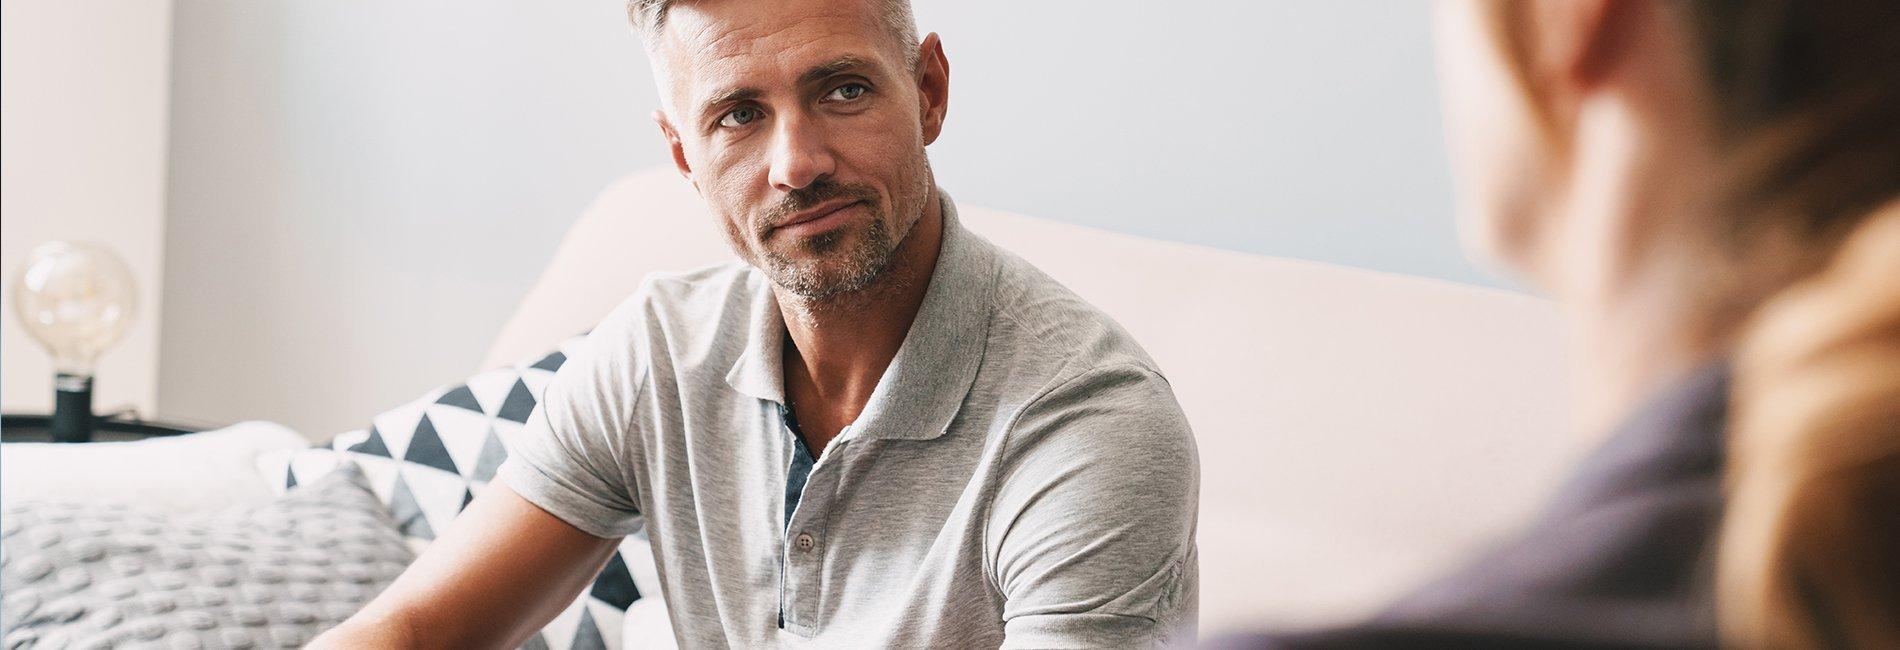 therapy-man-grey-shirt